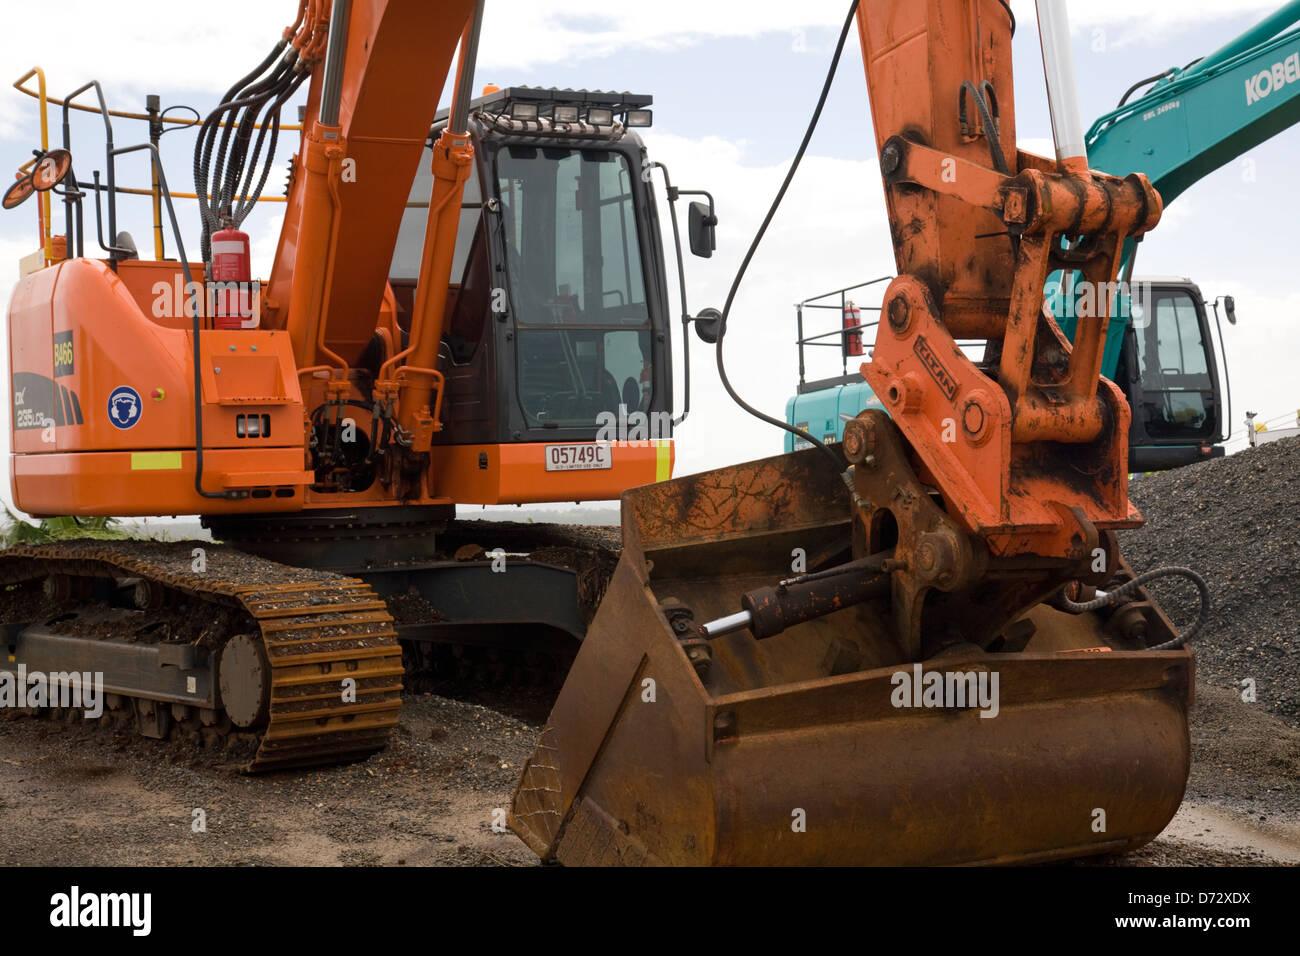 excavators on pacific highway project,australia - Stock Image